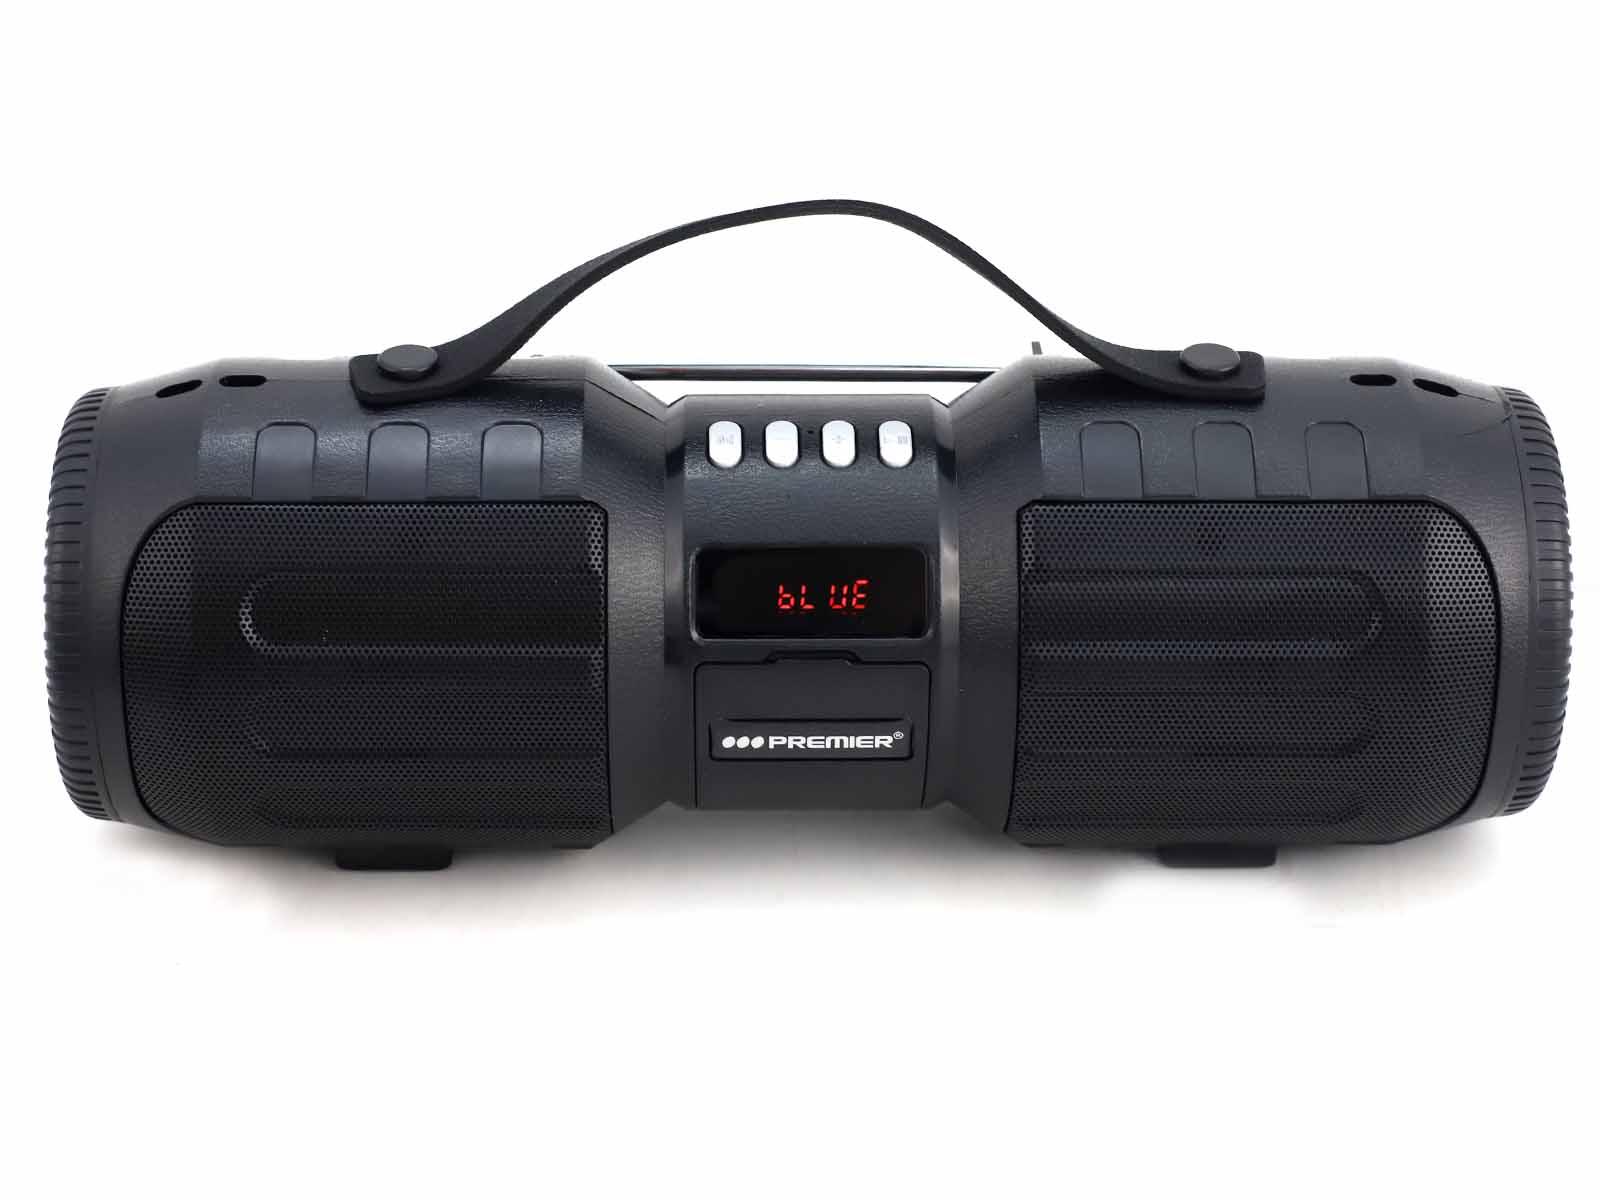 Imagen de producto Parlante portatil multimedia con bateria recargable 10